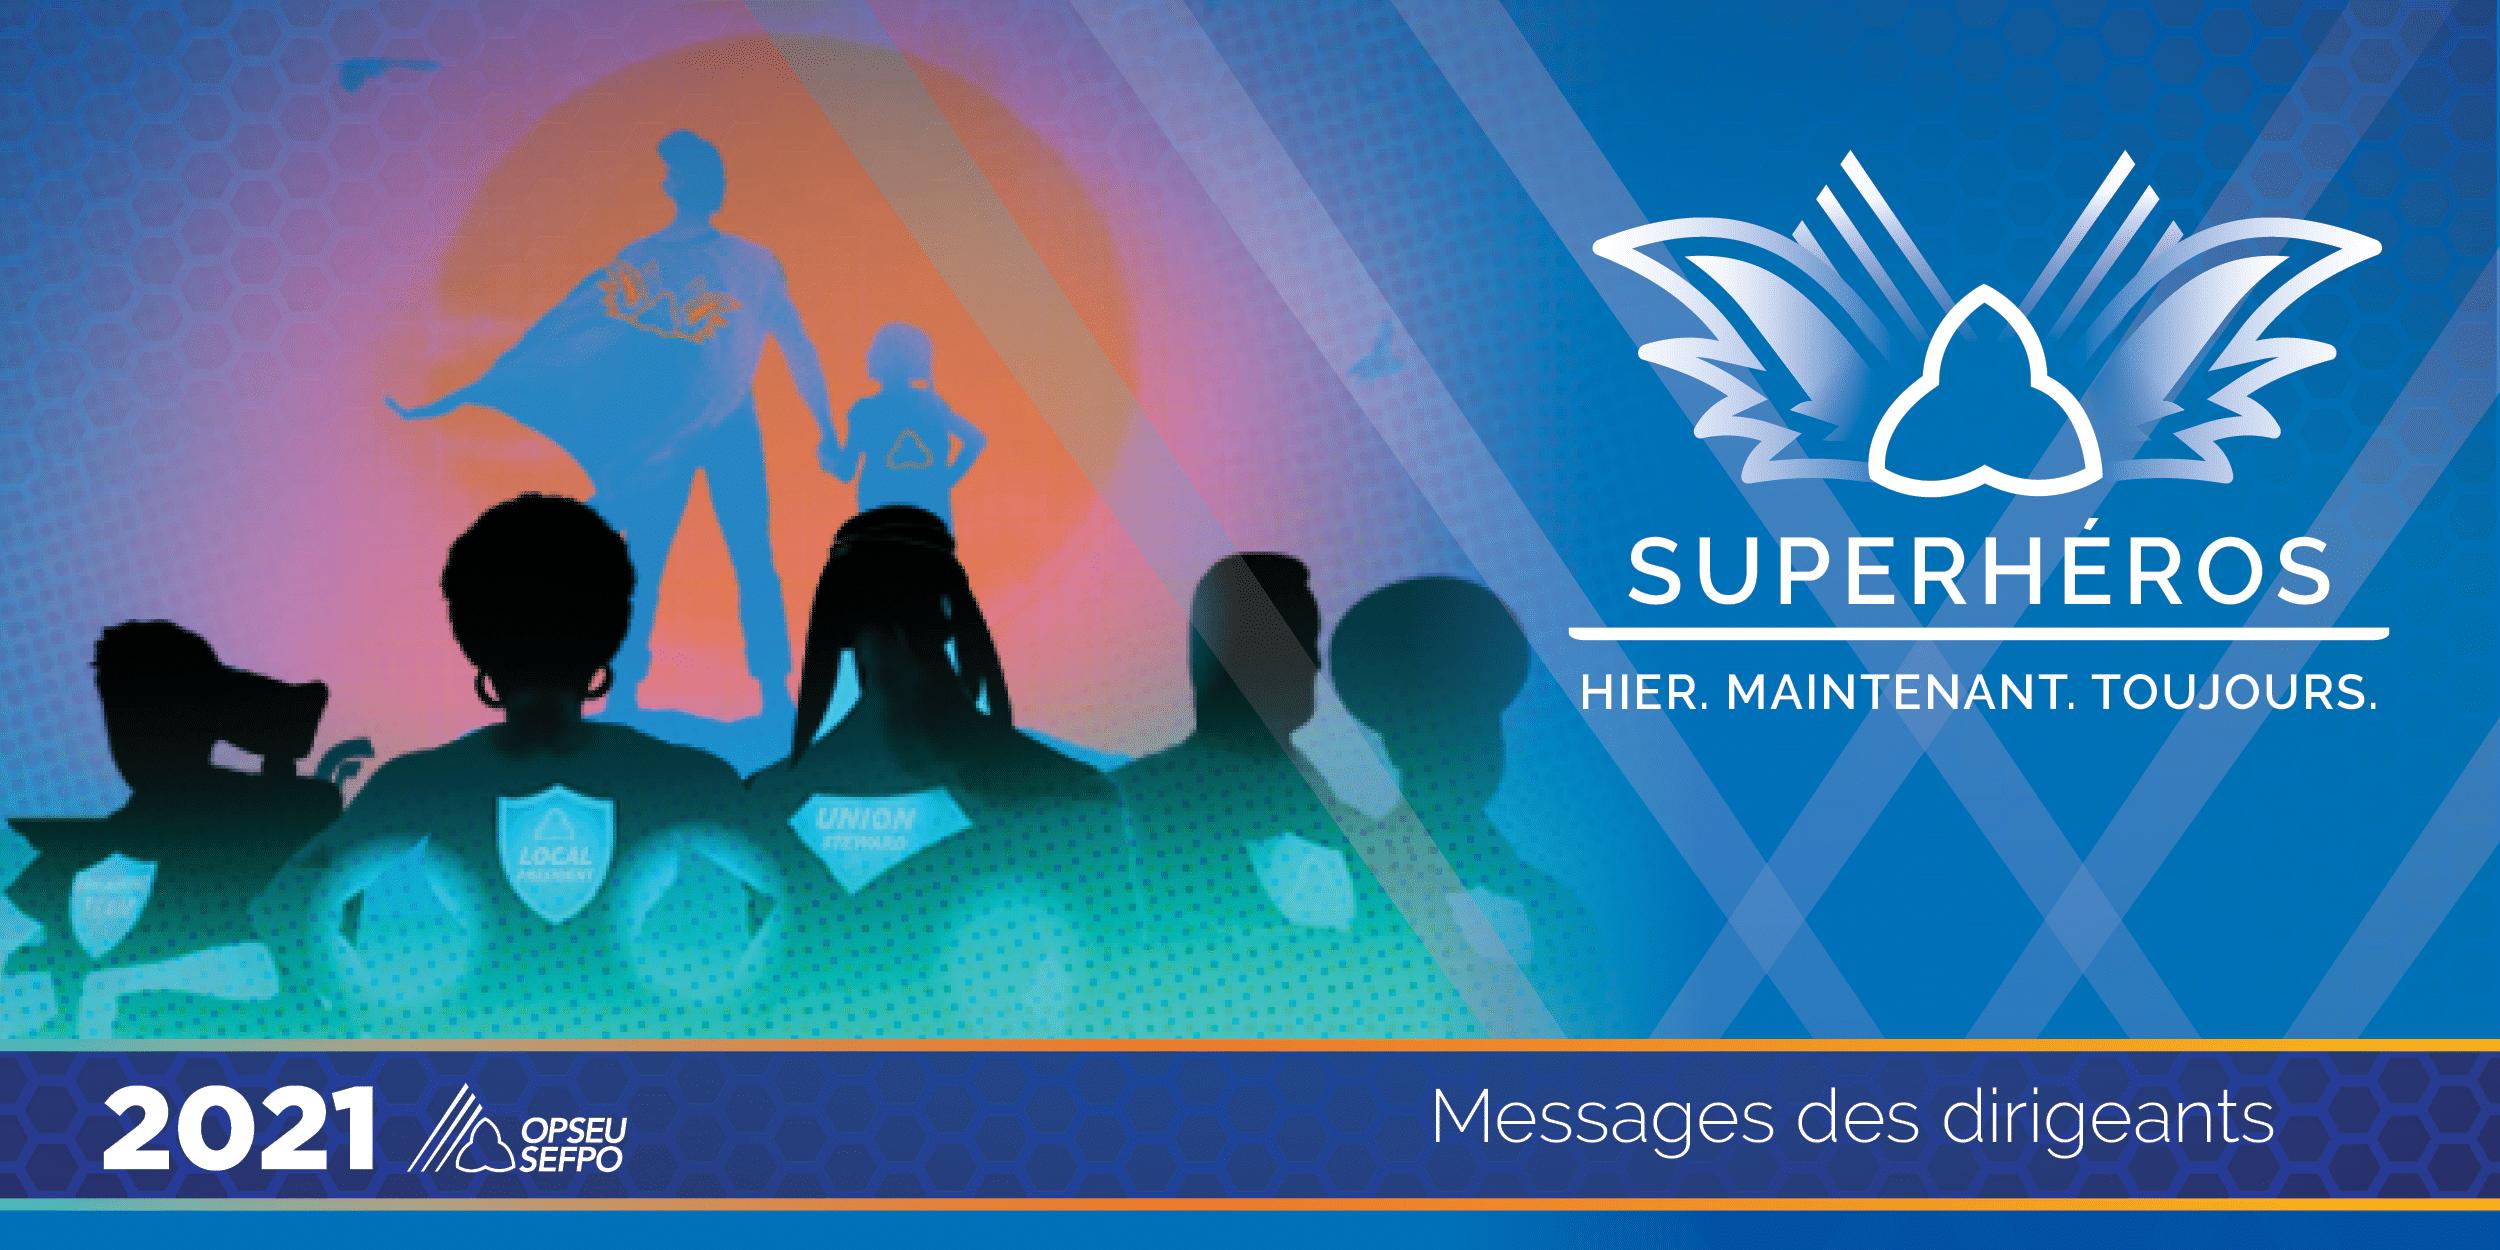 Message des dirigeants OPSEU/SEFPO: Superheros: Hier. Maintenant. Toujours.